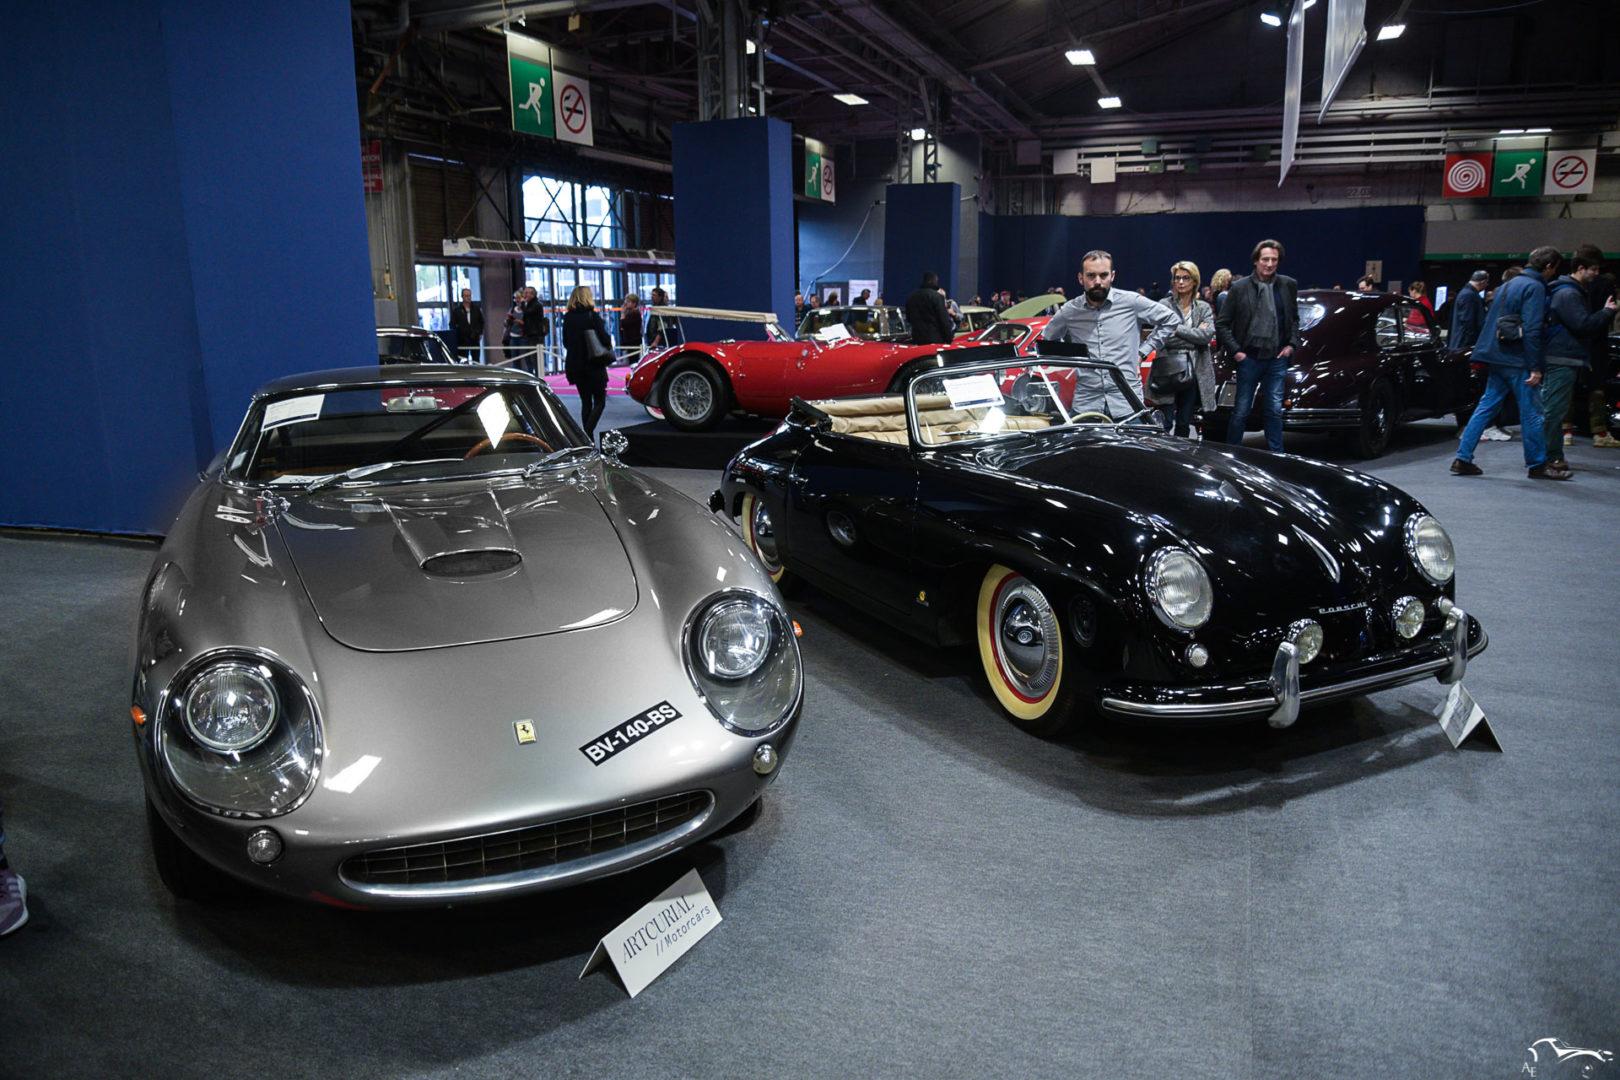 Ferrari 275 GTC & Porsche 356